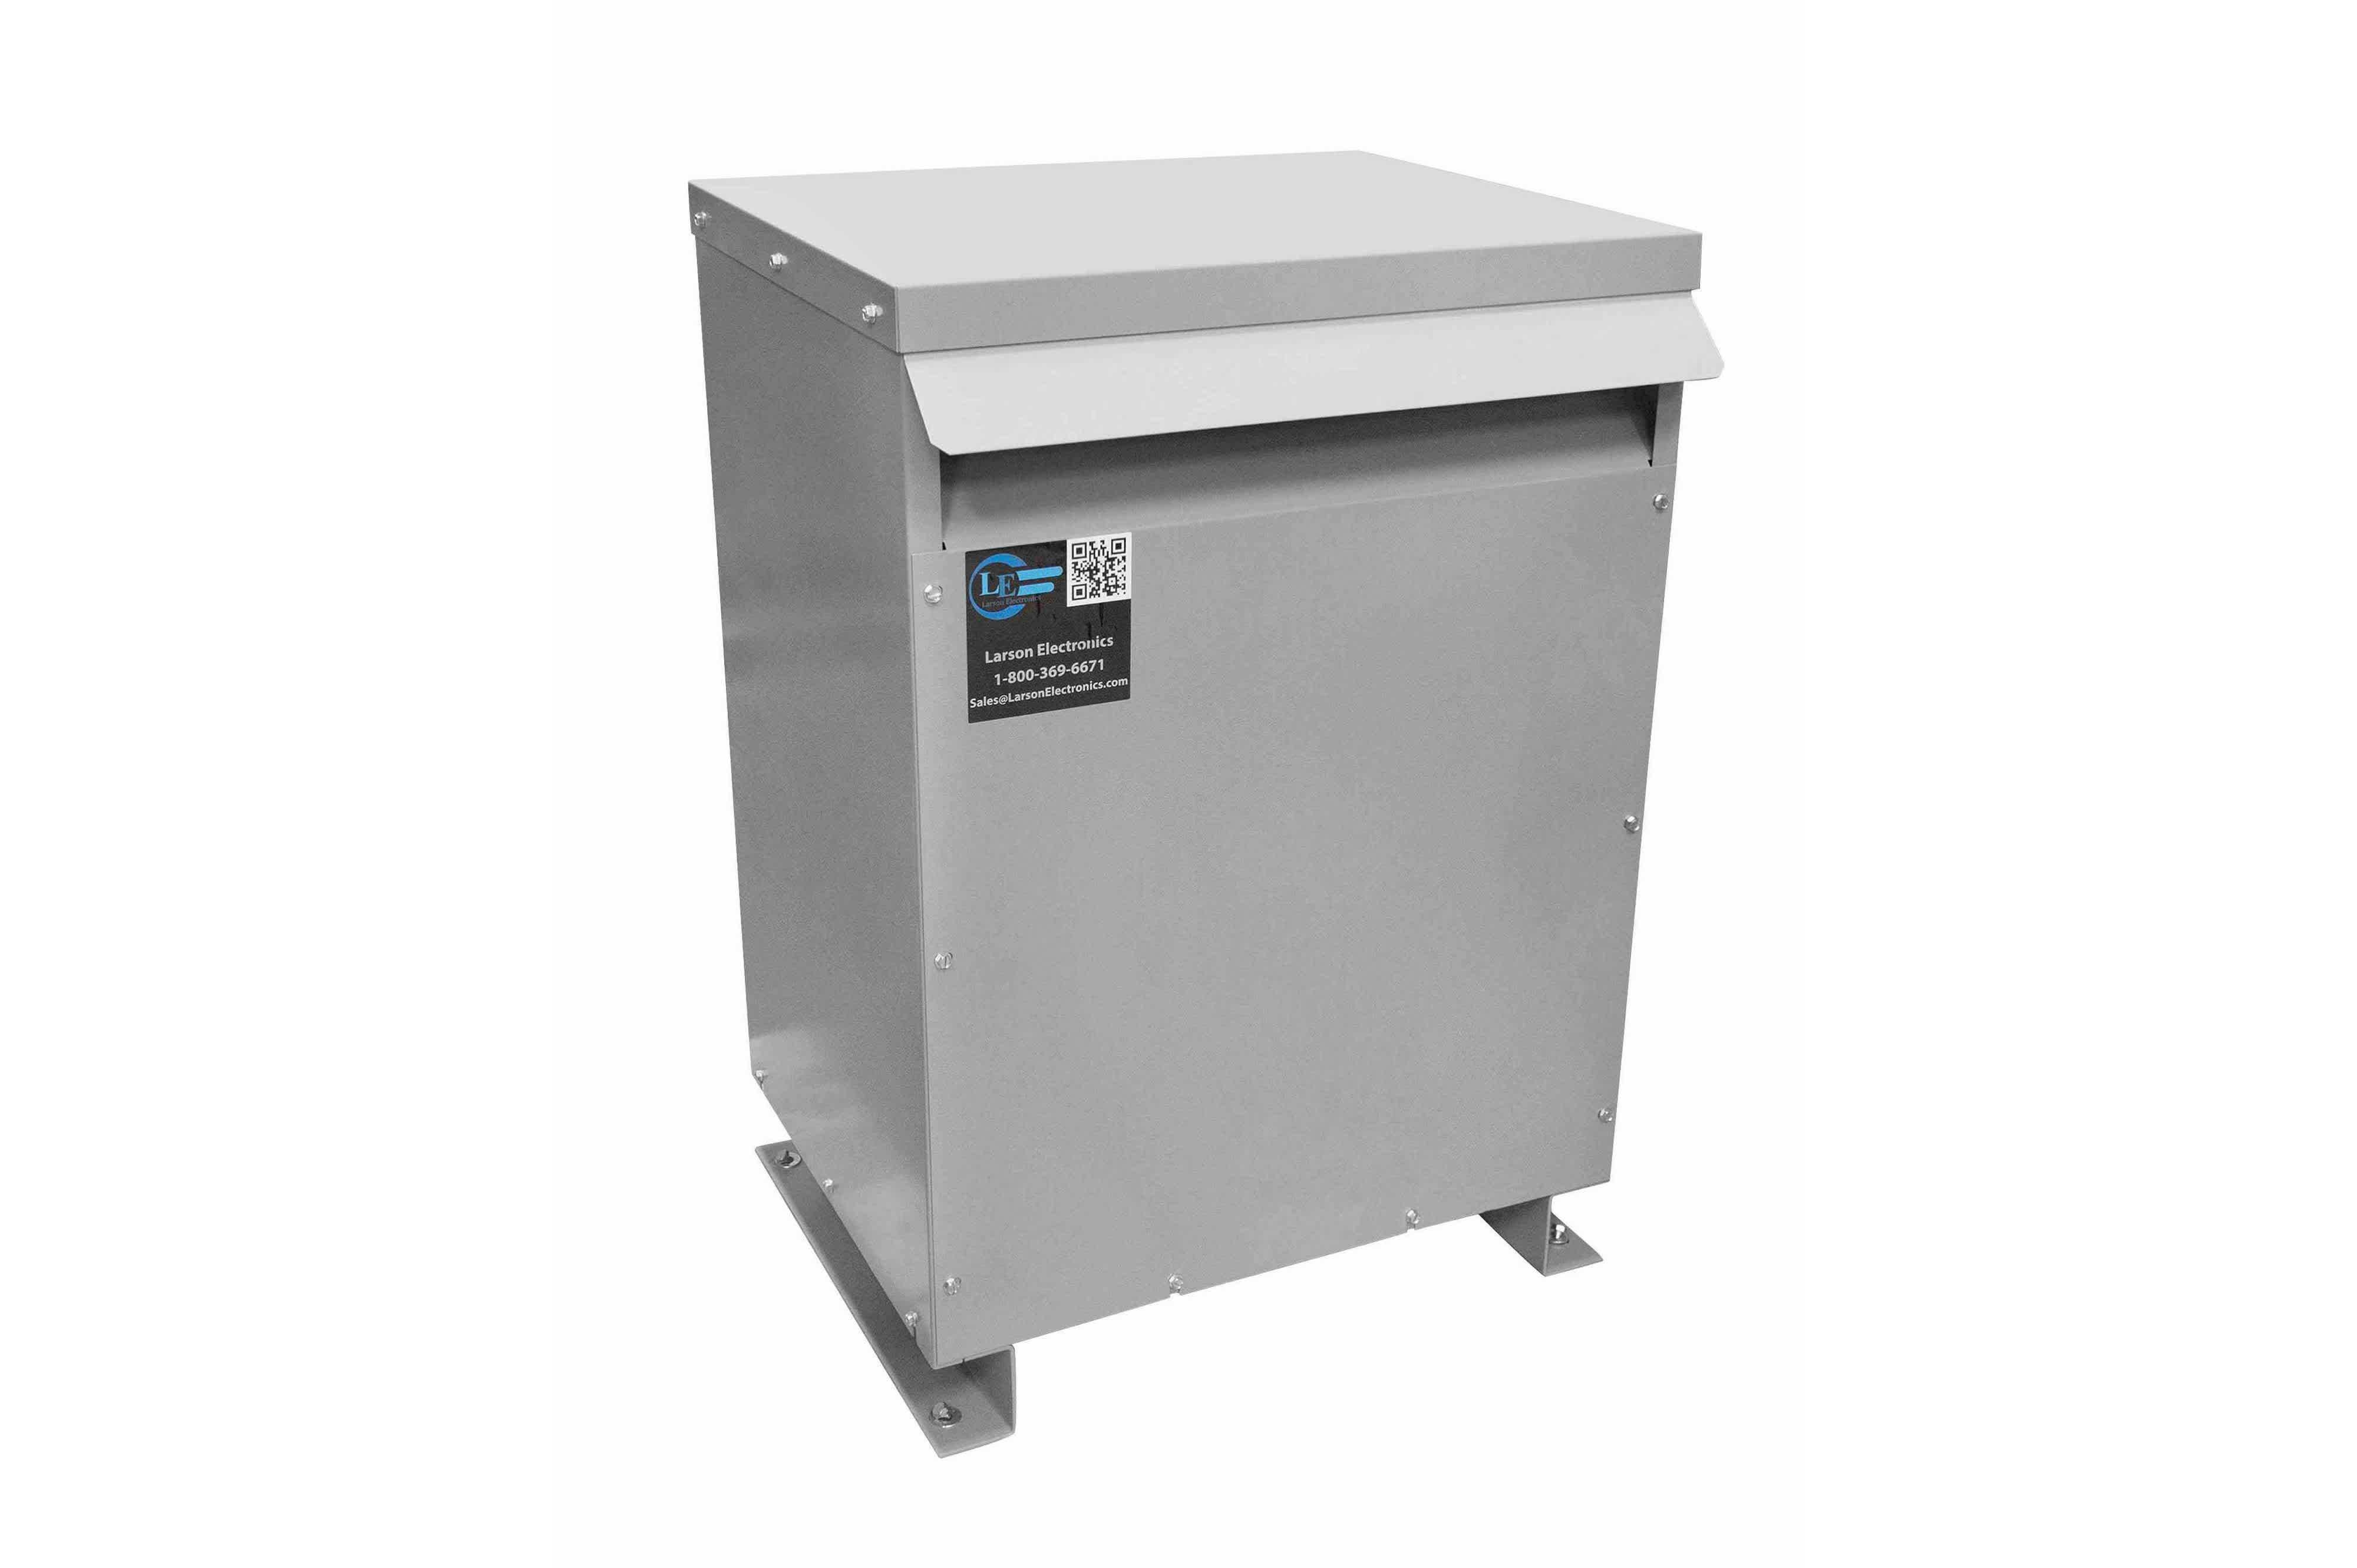 500 kVA 3PH DOE Transformer, 380V Delta Primary, 600Y/347 Wye-N Secondary, N3R, Ventilated, 60 Hz